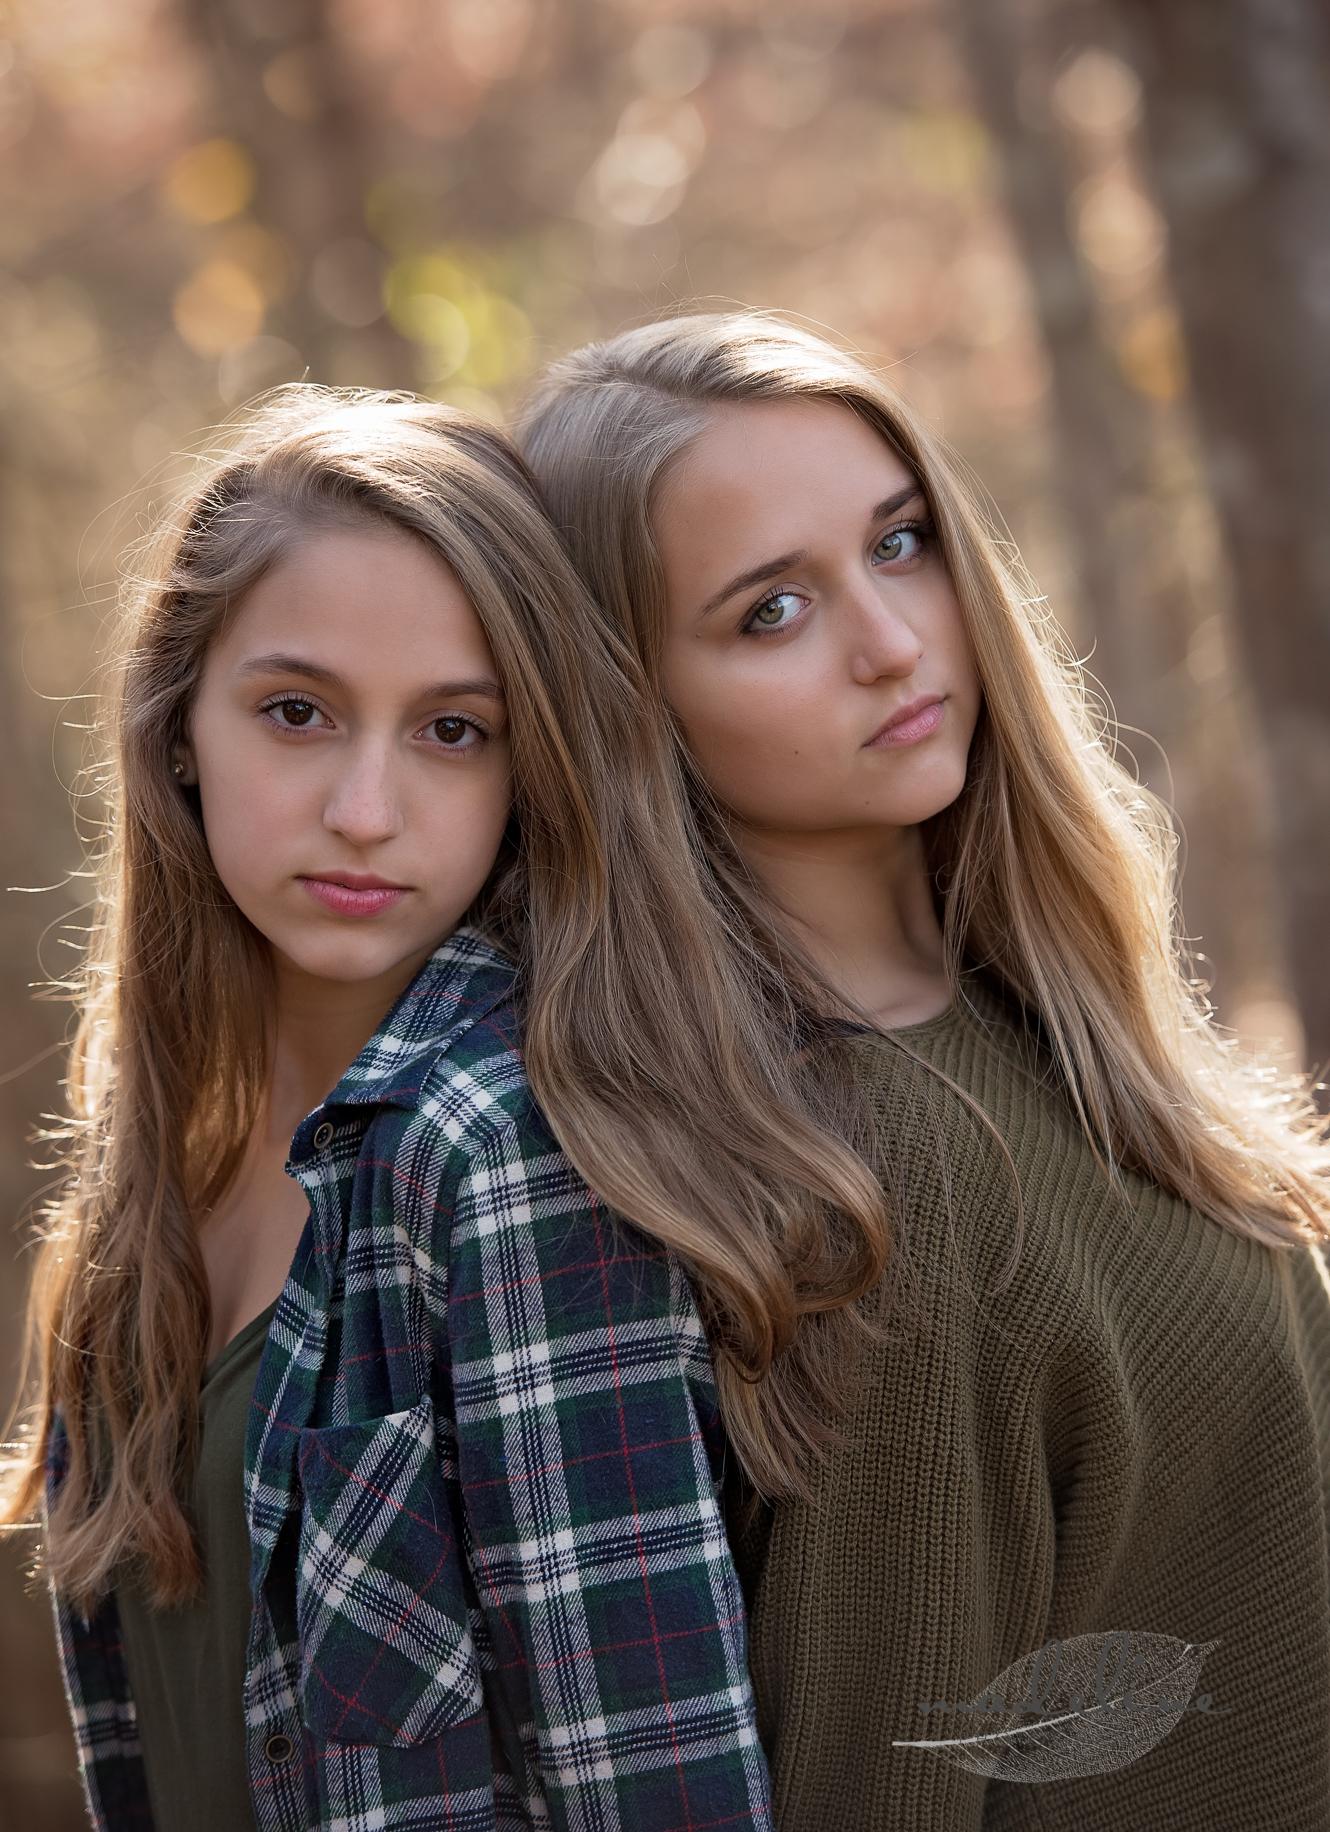 Teen Models — Millie Lewis of Charleston Model & Talent